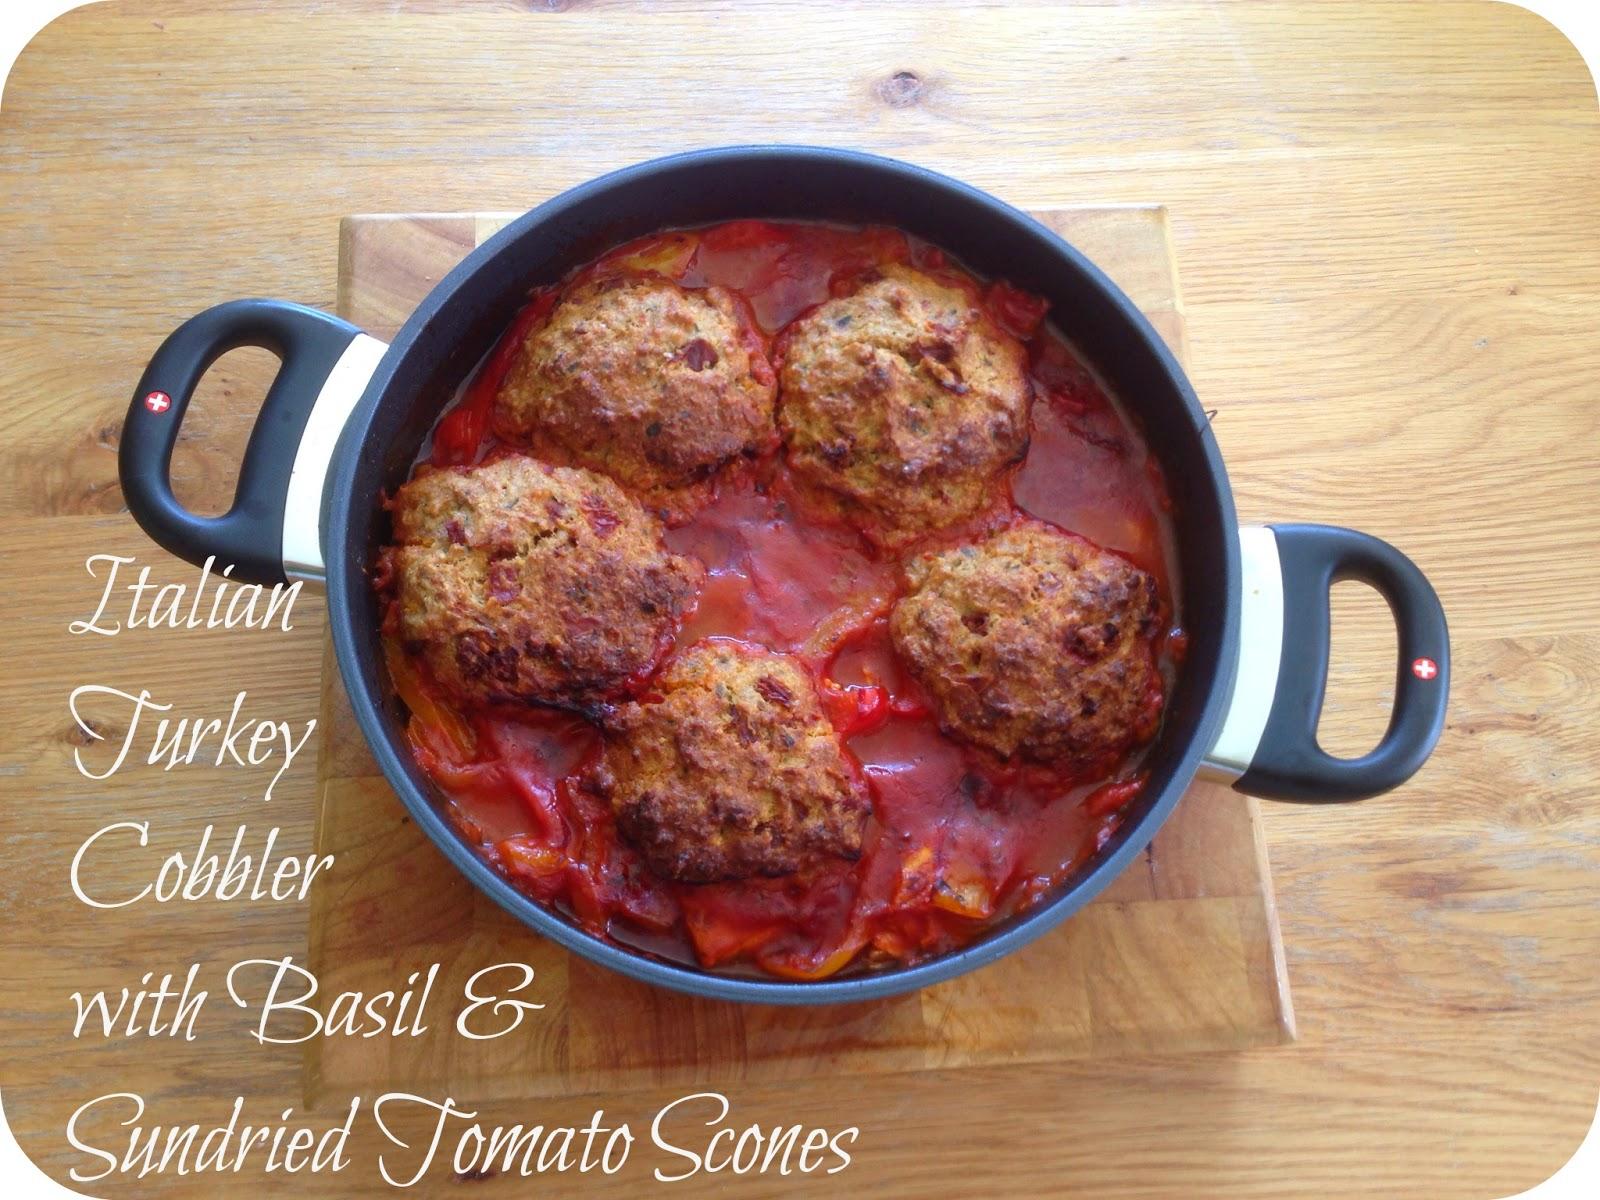 Italian Turkey Cobbler with Basil & Sundried Tomato Scones ...